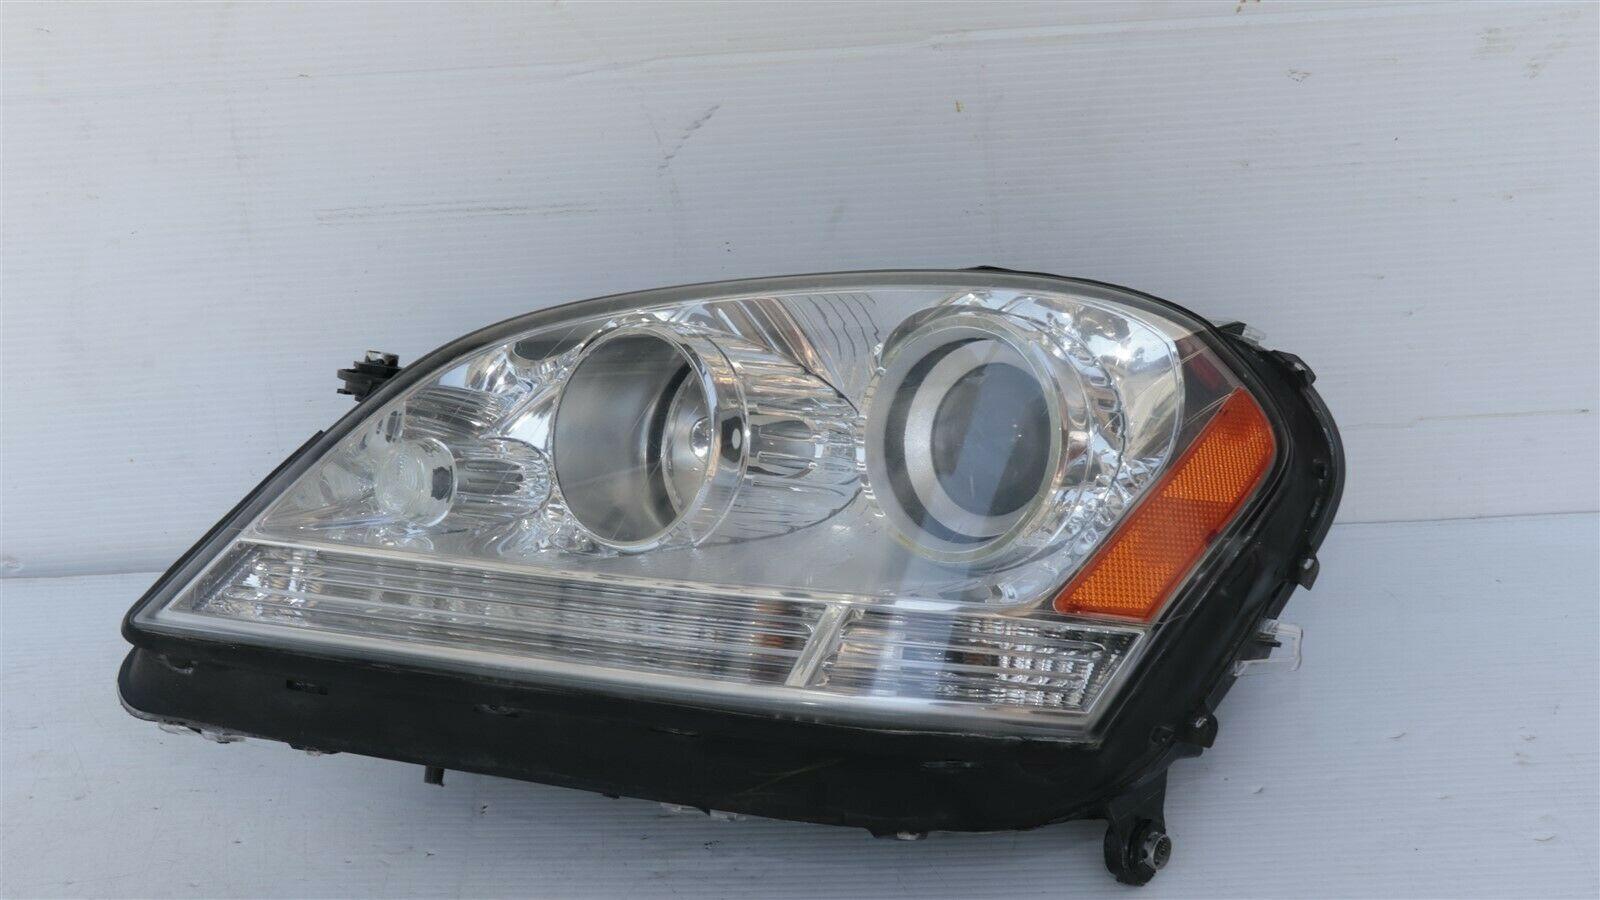 07-12 Mercedes Benz W164 ML320 GL450 Headlight Lamp Halogen Driver Left LH